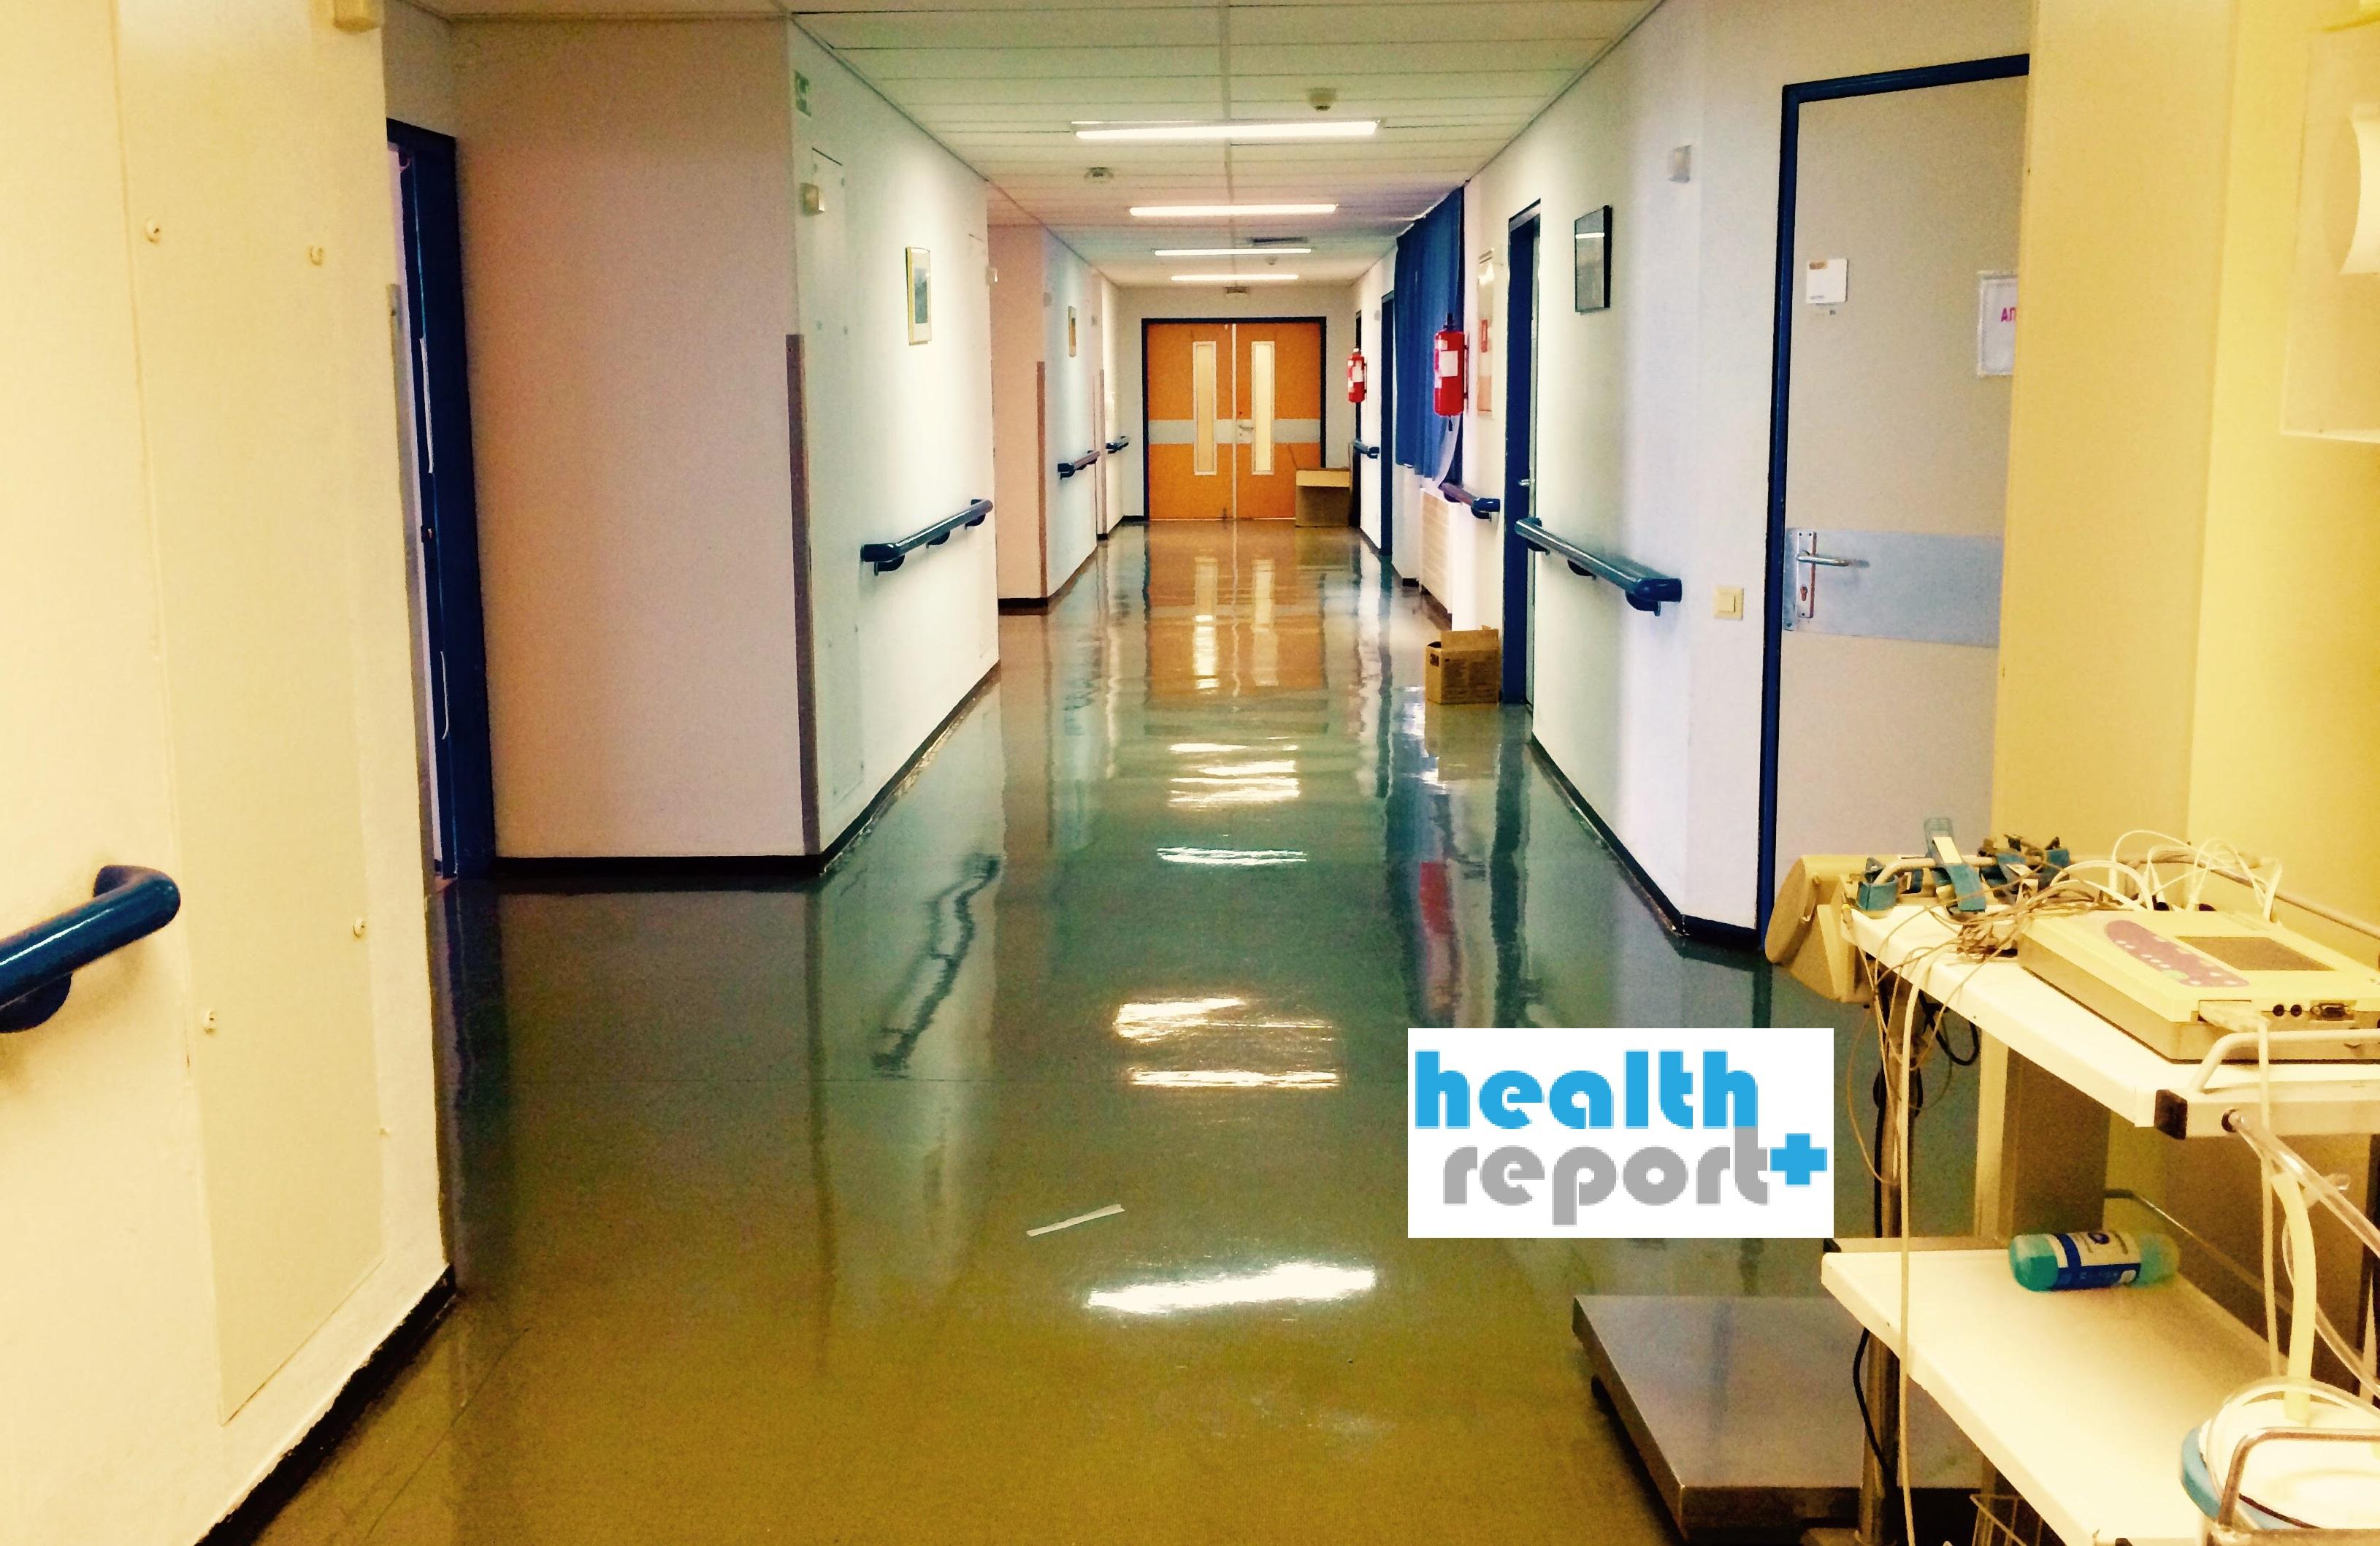 Photo of Διοικητές Νοσοκομείων: Γιατί δεν έχουν εκδοθεί ακόμη τα ΦΕΚ των διορισμών τους! Οι καθυστερήσεις και οι νέοι έλεγχοι